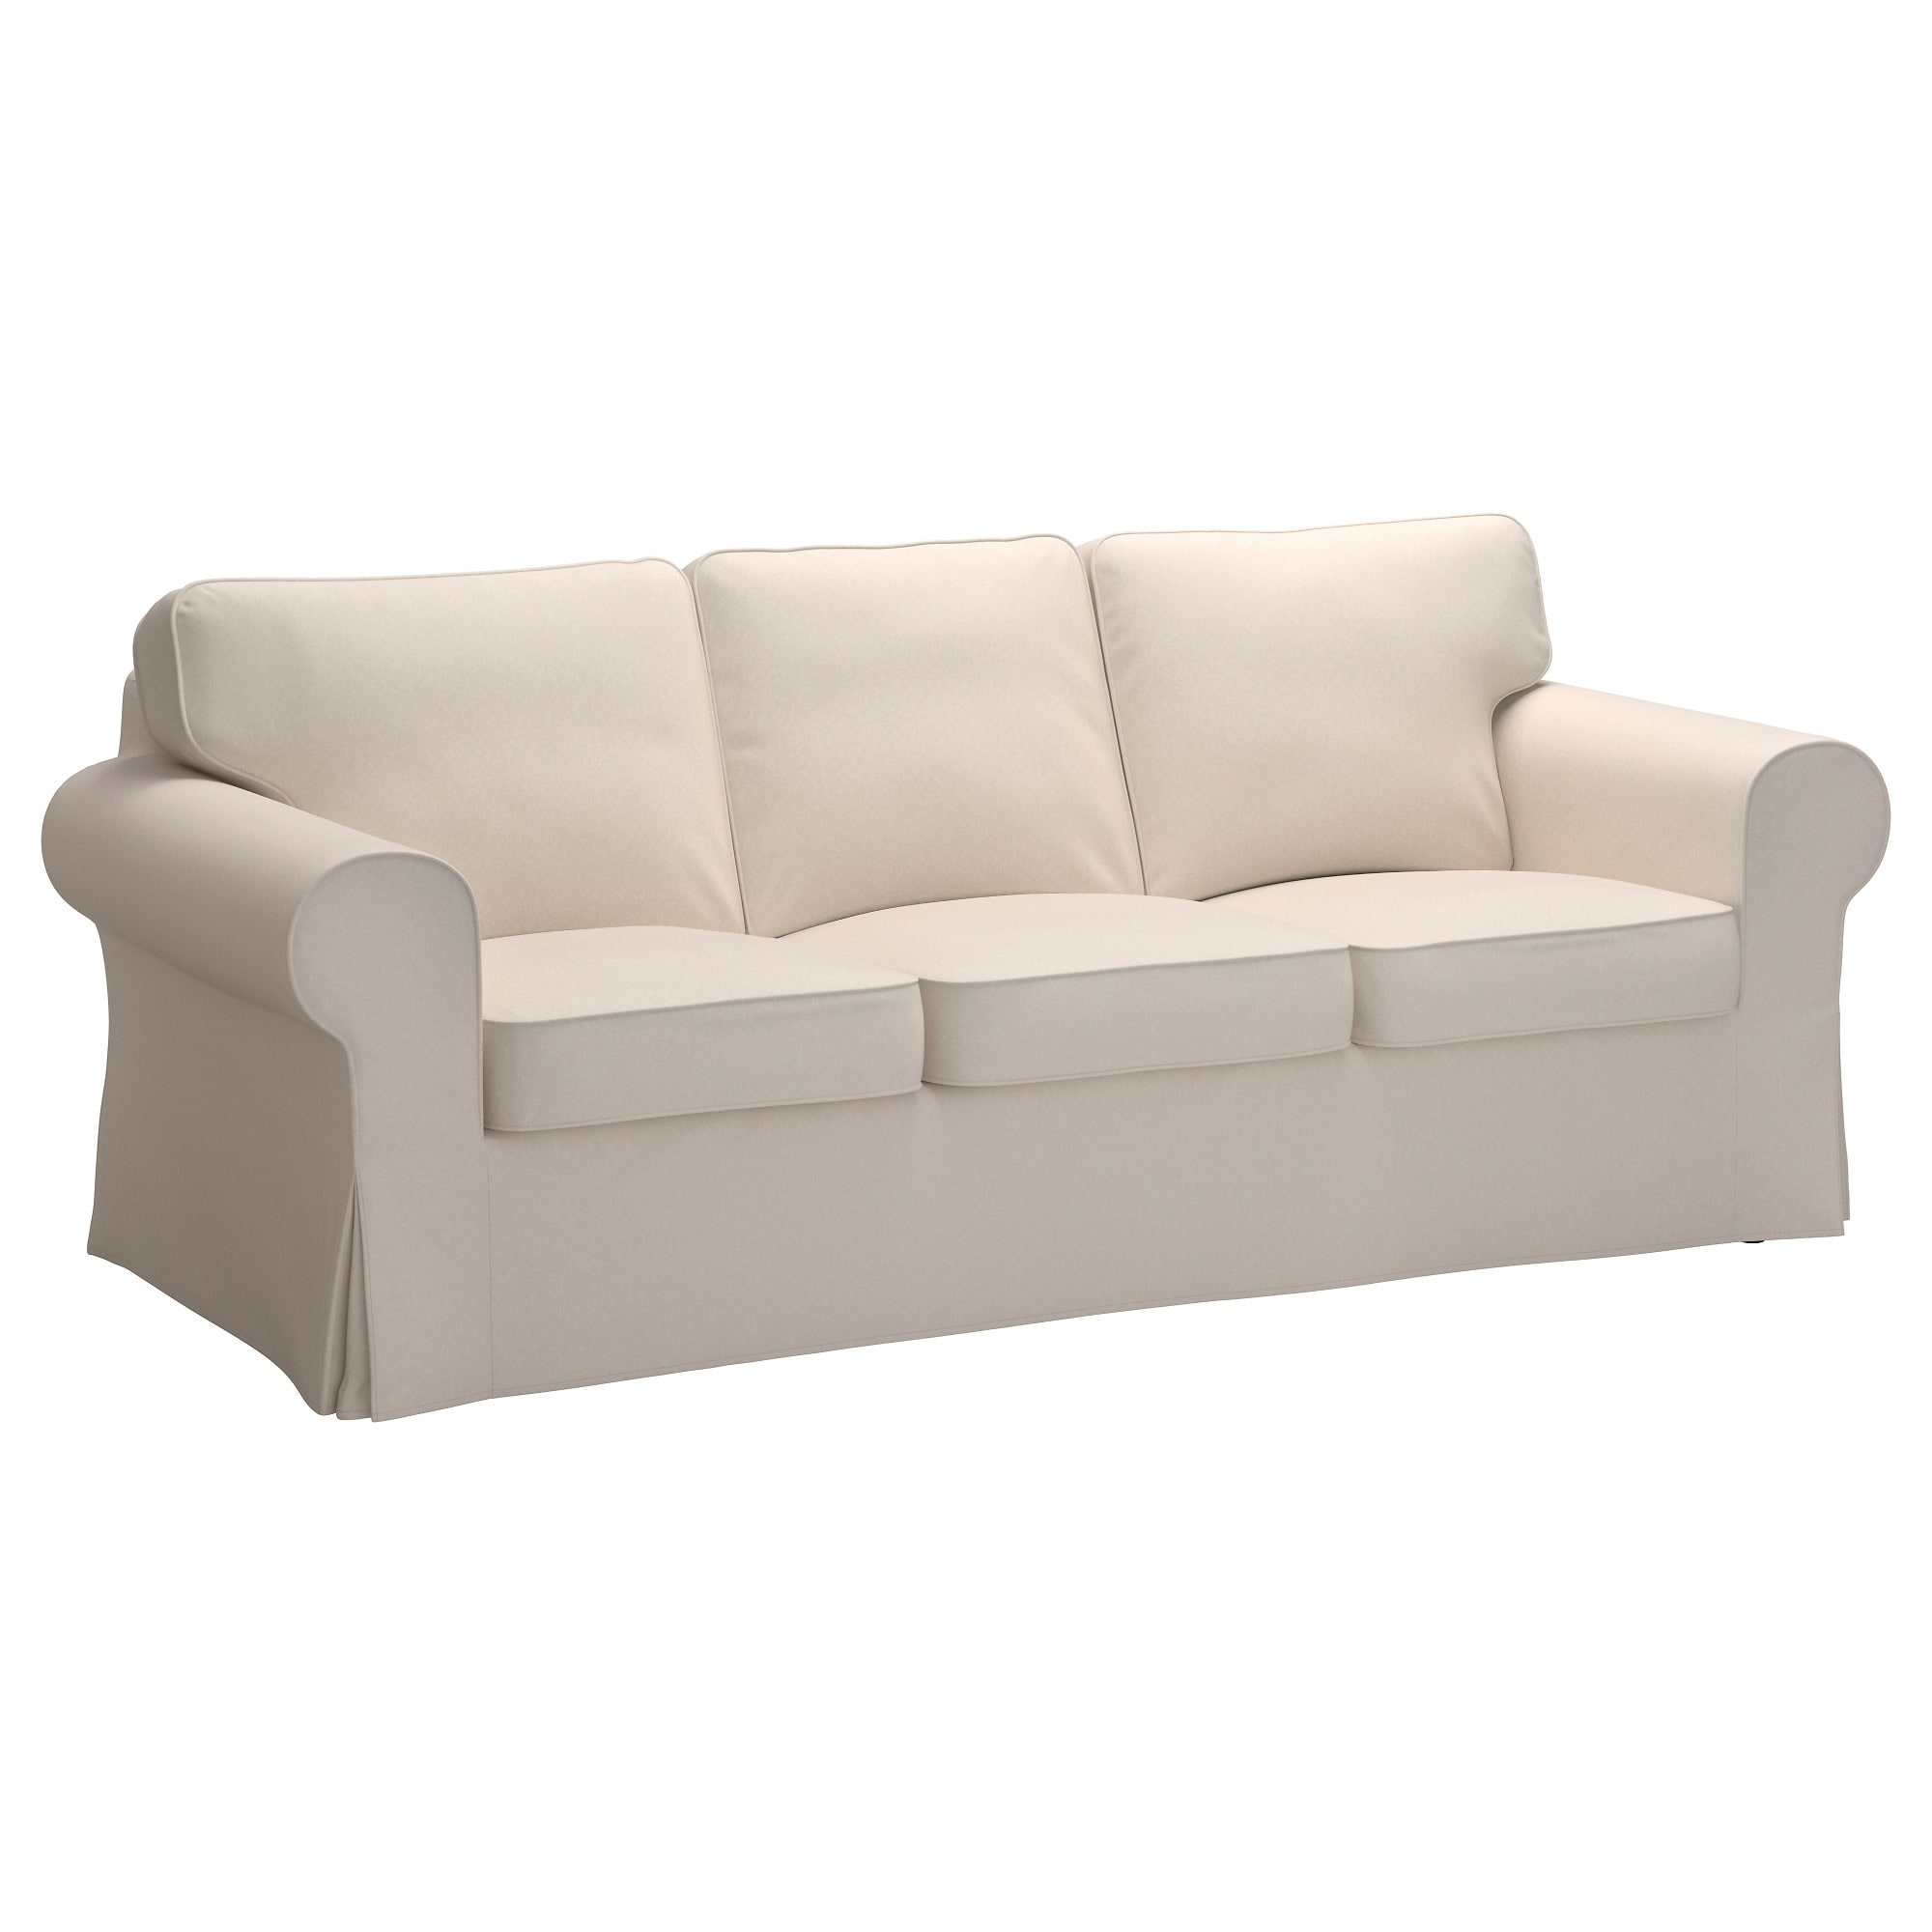 Sofas Tres Plazas O2d5 Ektorp sofà 3 Plazas Lofallet Beige Ikea